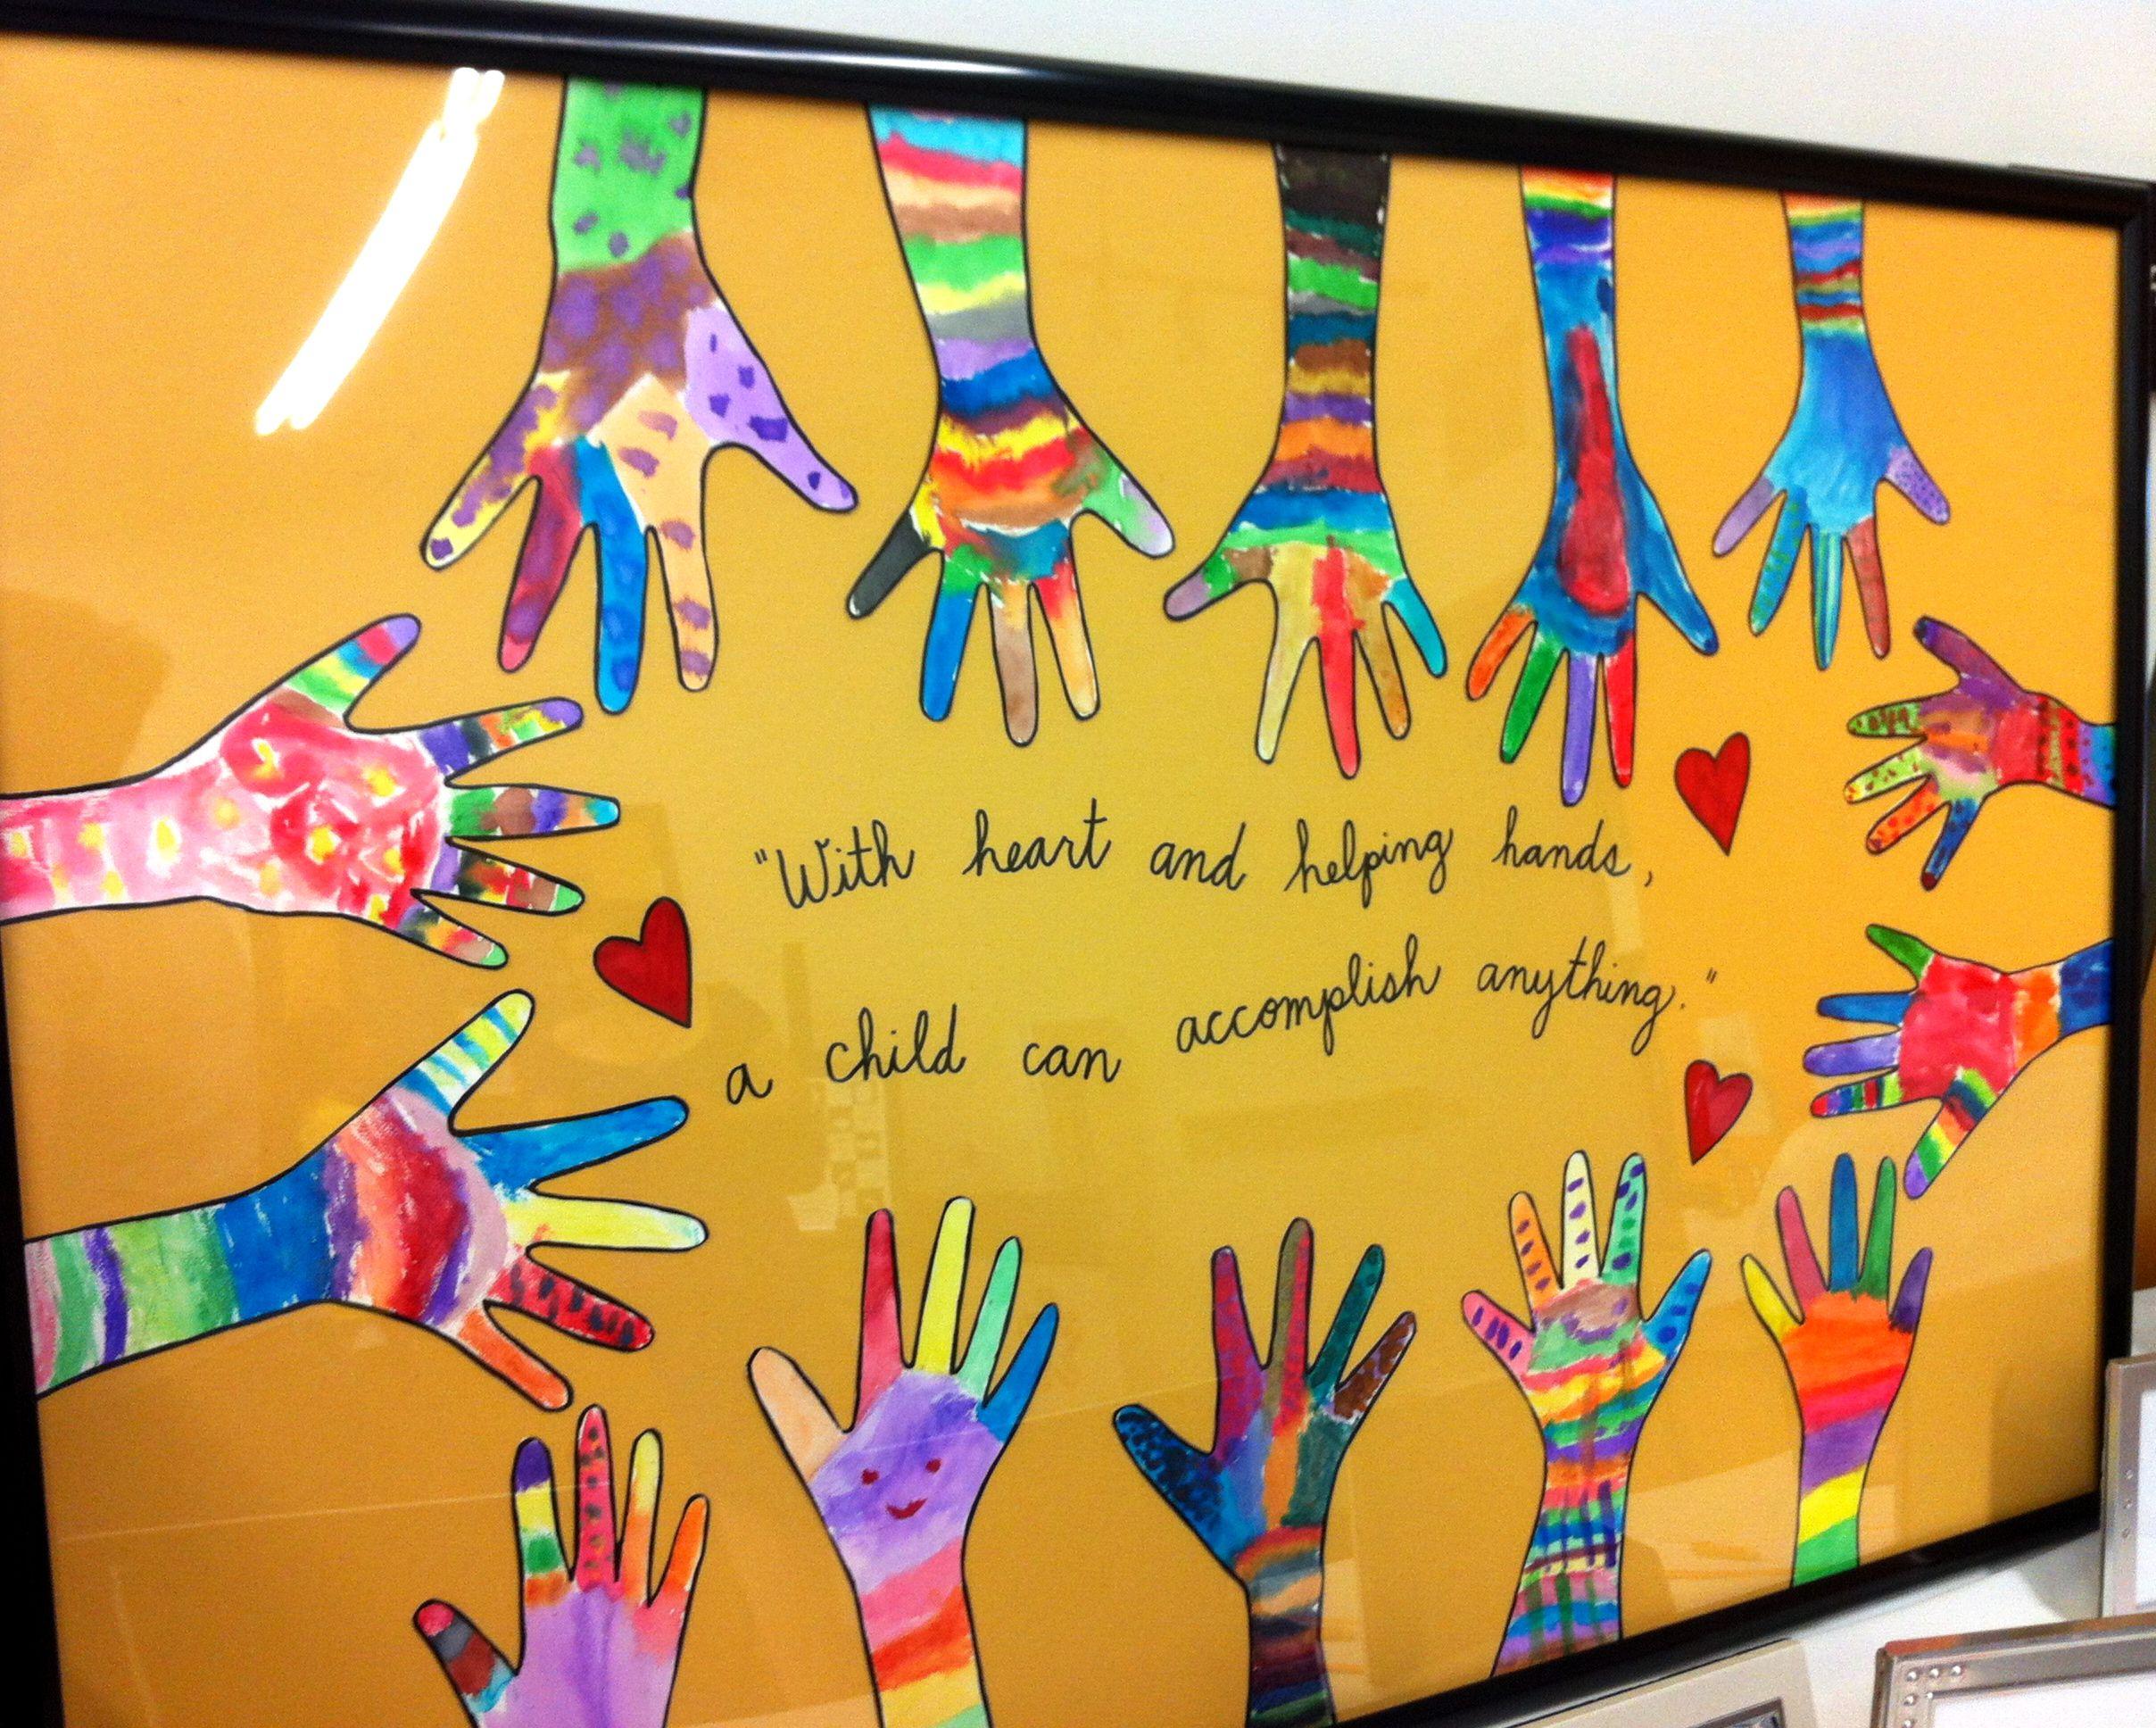 Helping Hands School Auction Item